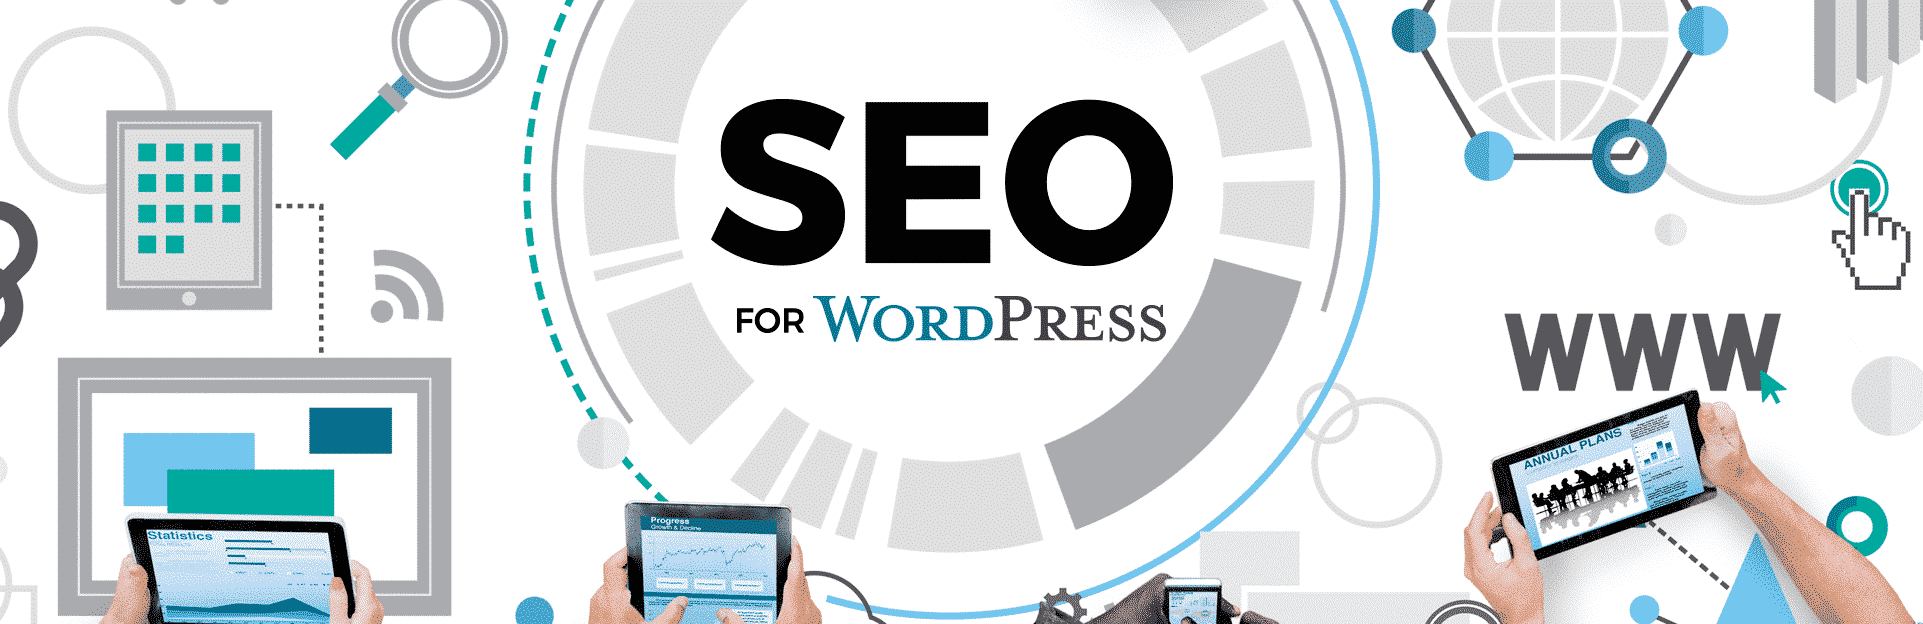 LTTR-SEO-Wordpress-3.0